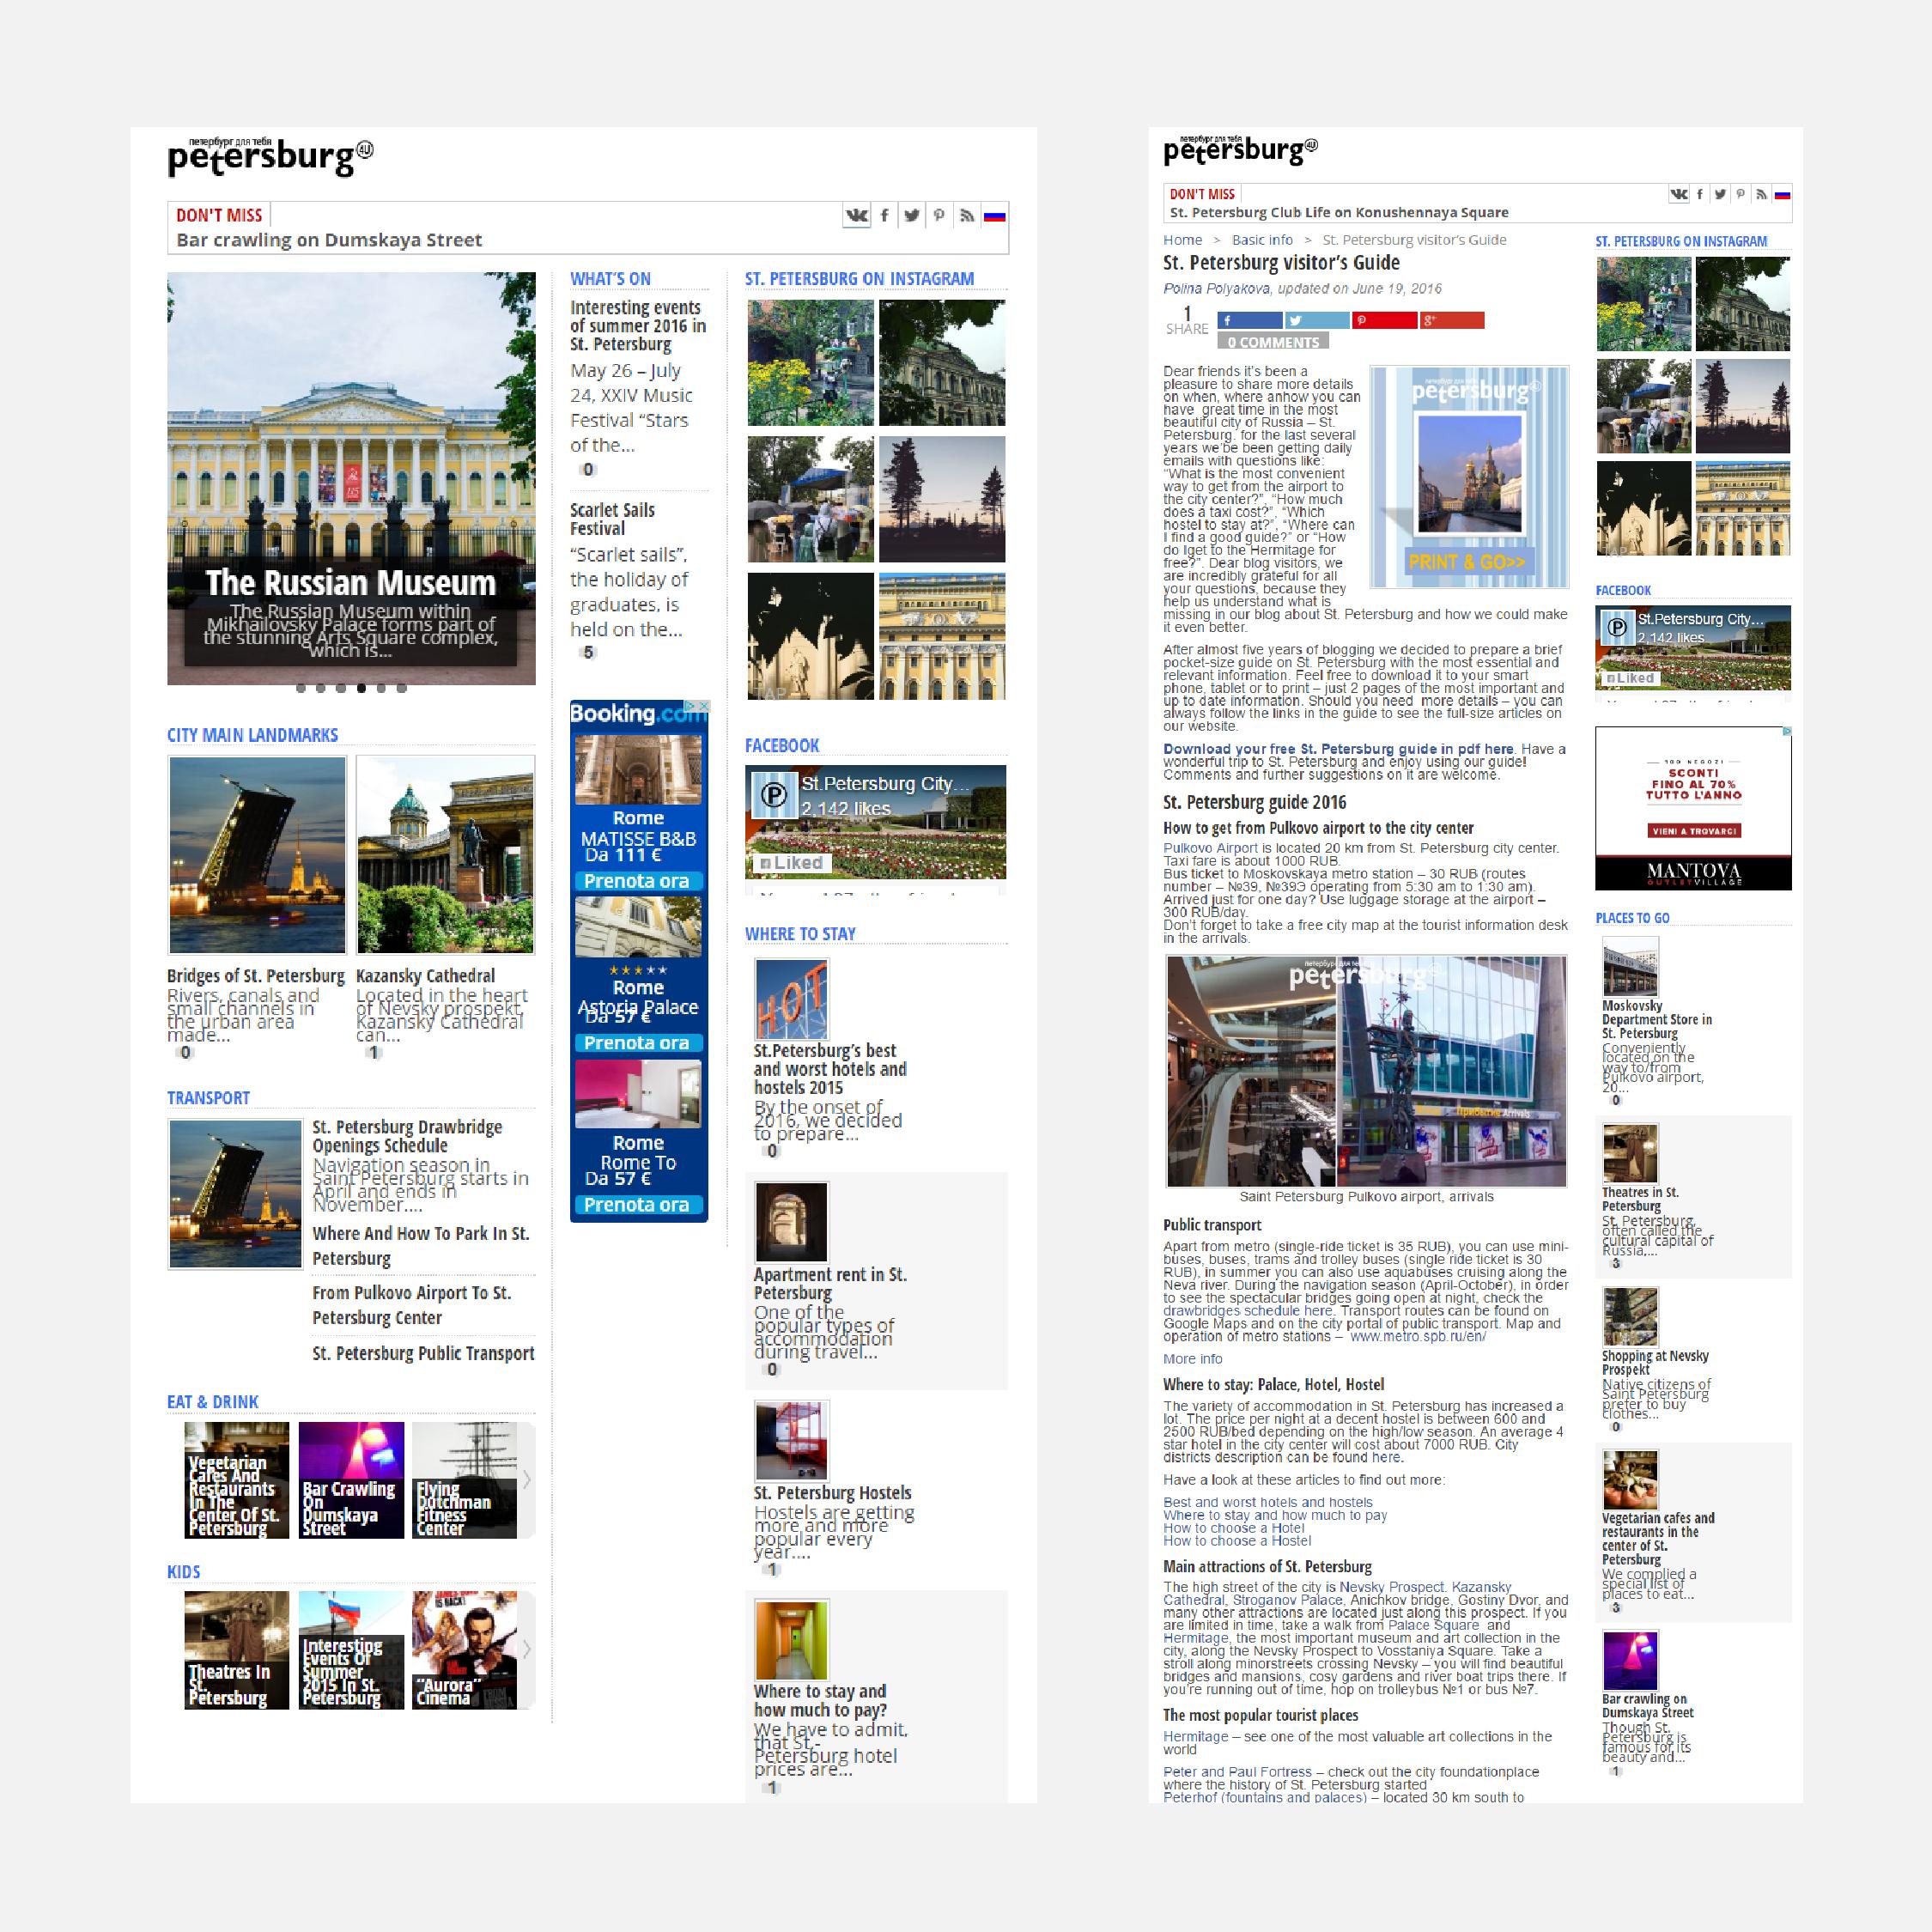 blog petersburg4u.com